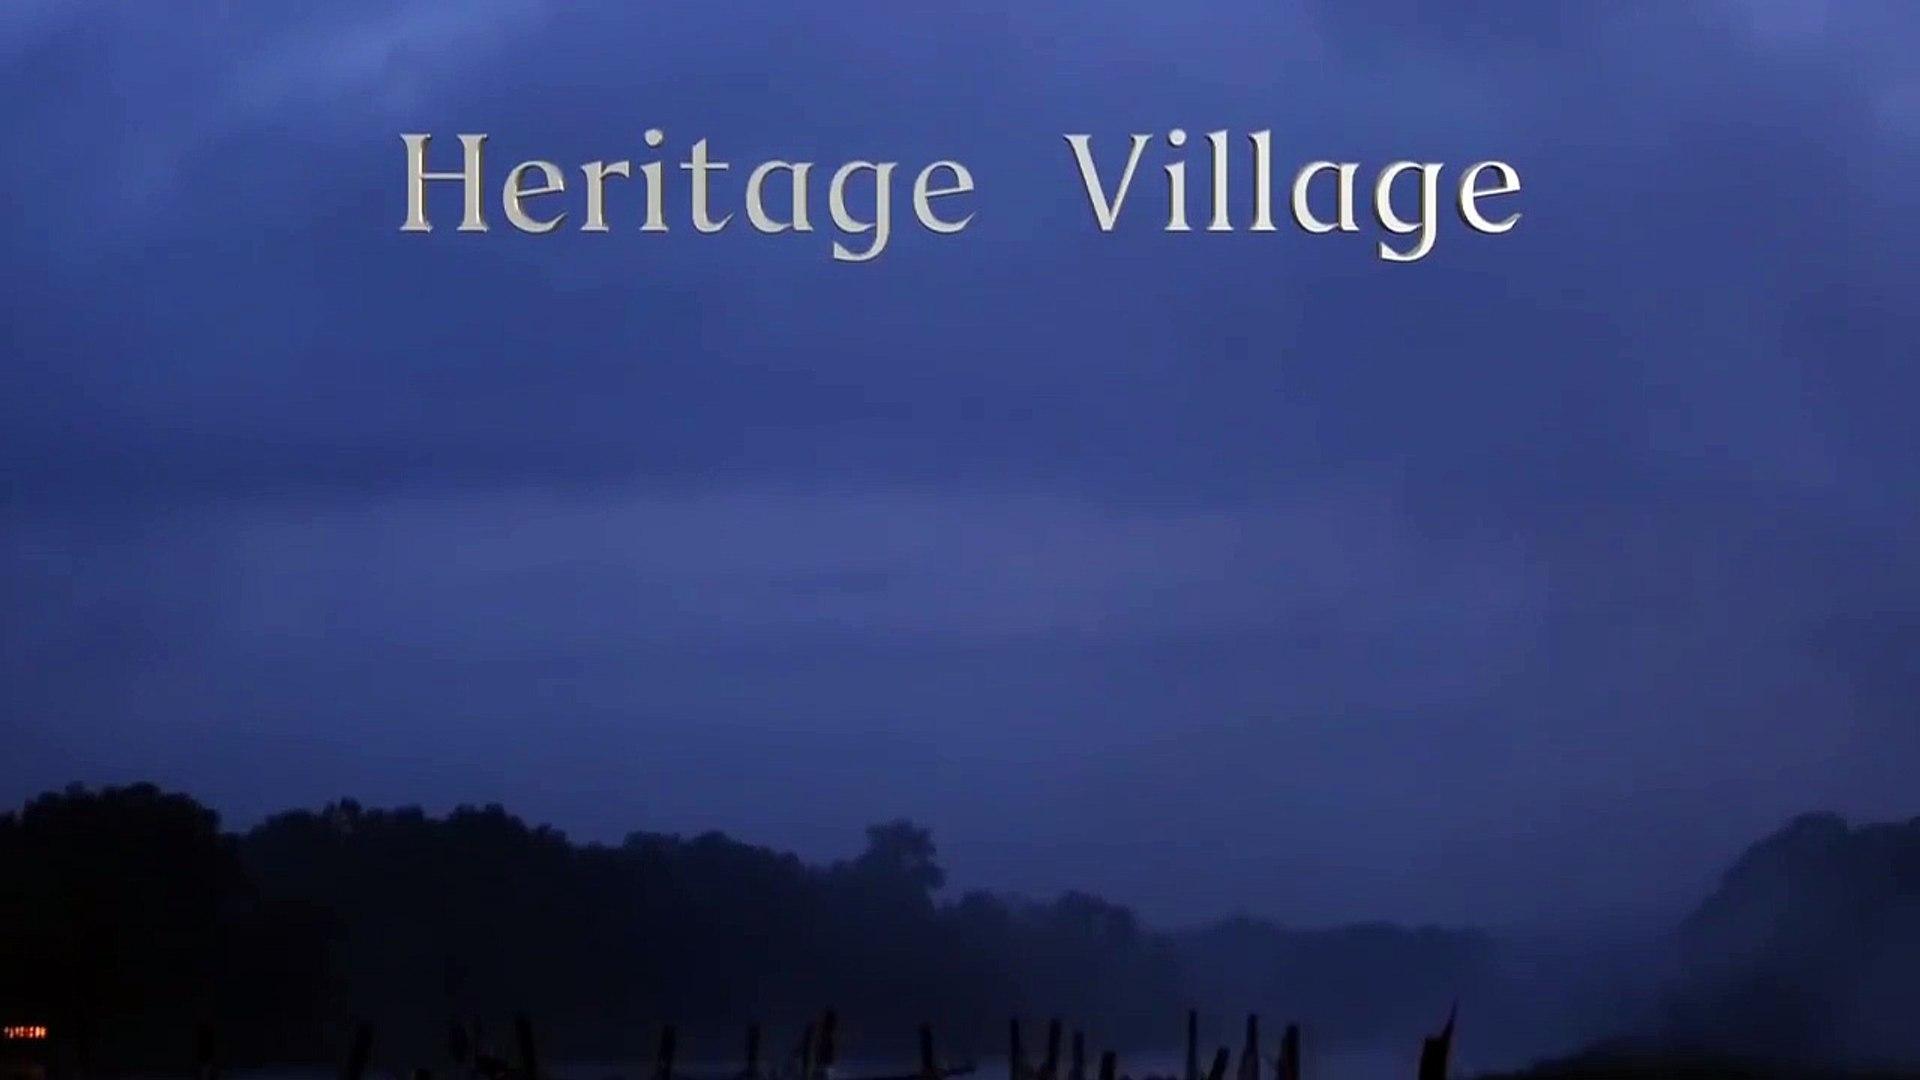 Heritage Village, A